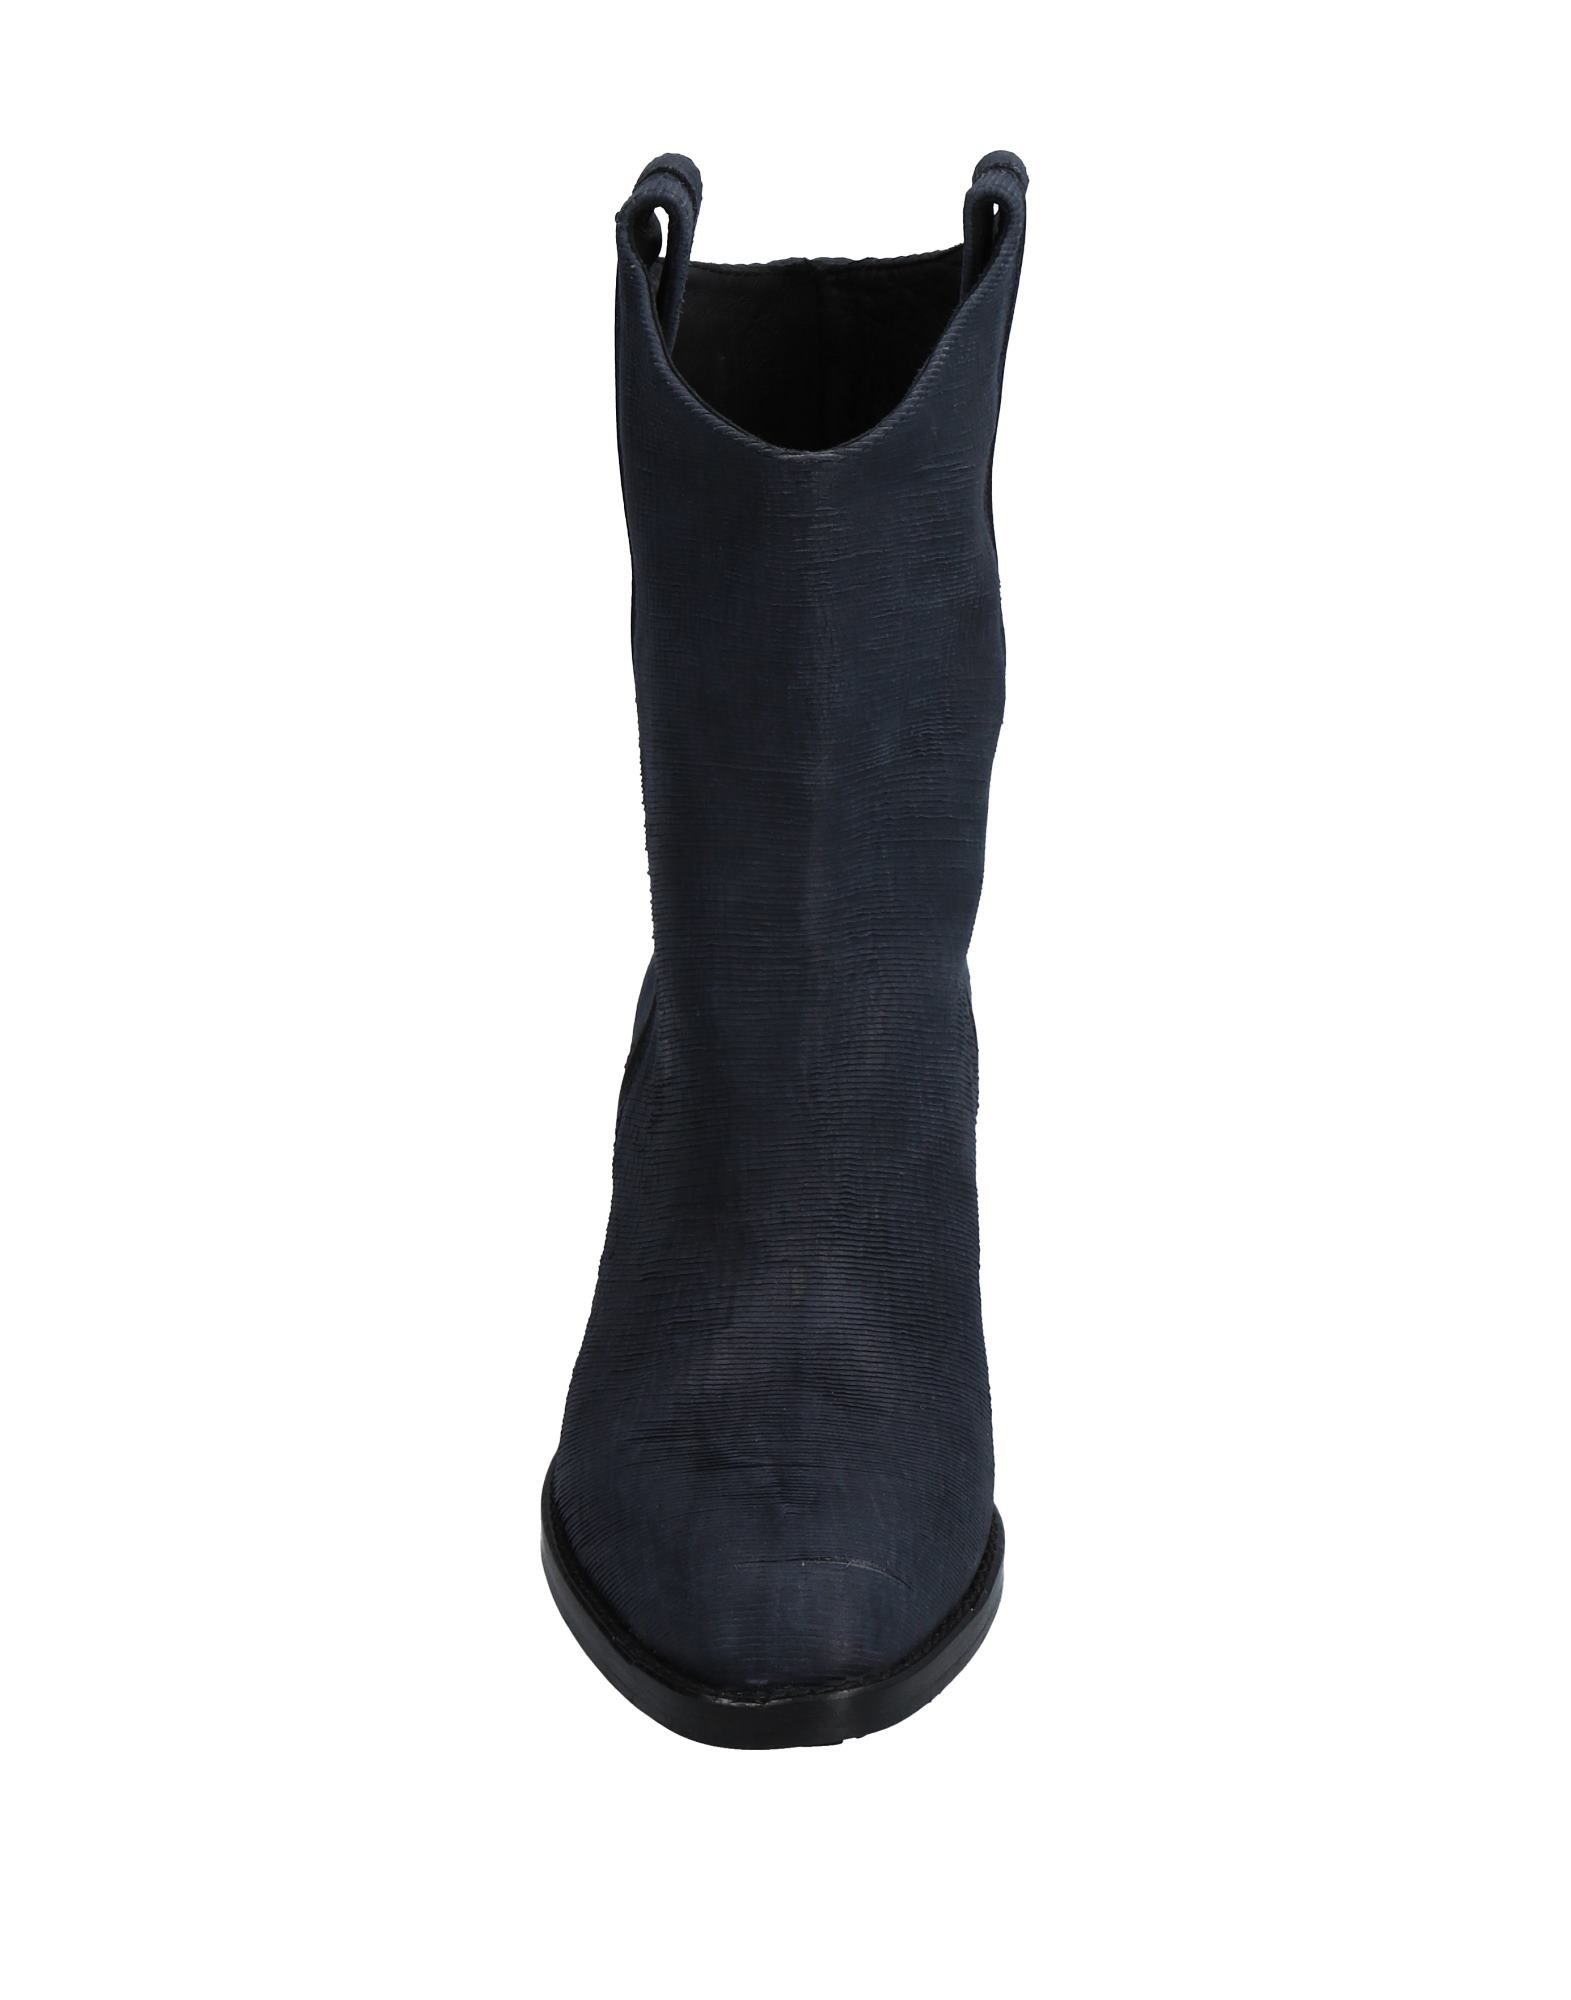 87 Vic Matiē Stiefelette Damen Schuhe  11532756IXGut aussehende strapazierfähige Schuhe Damen be5261